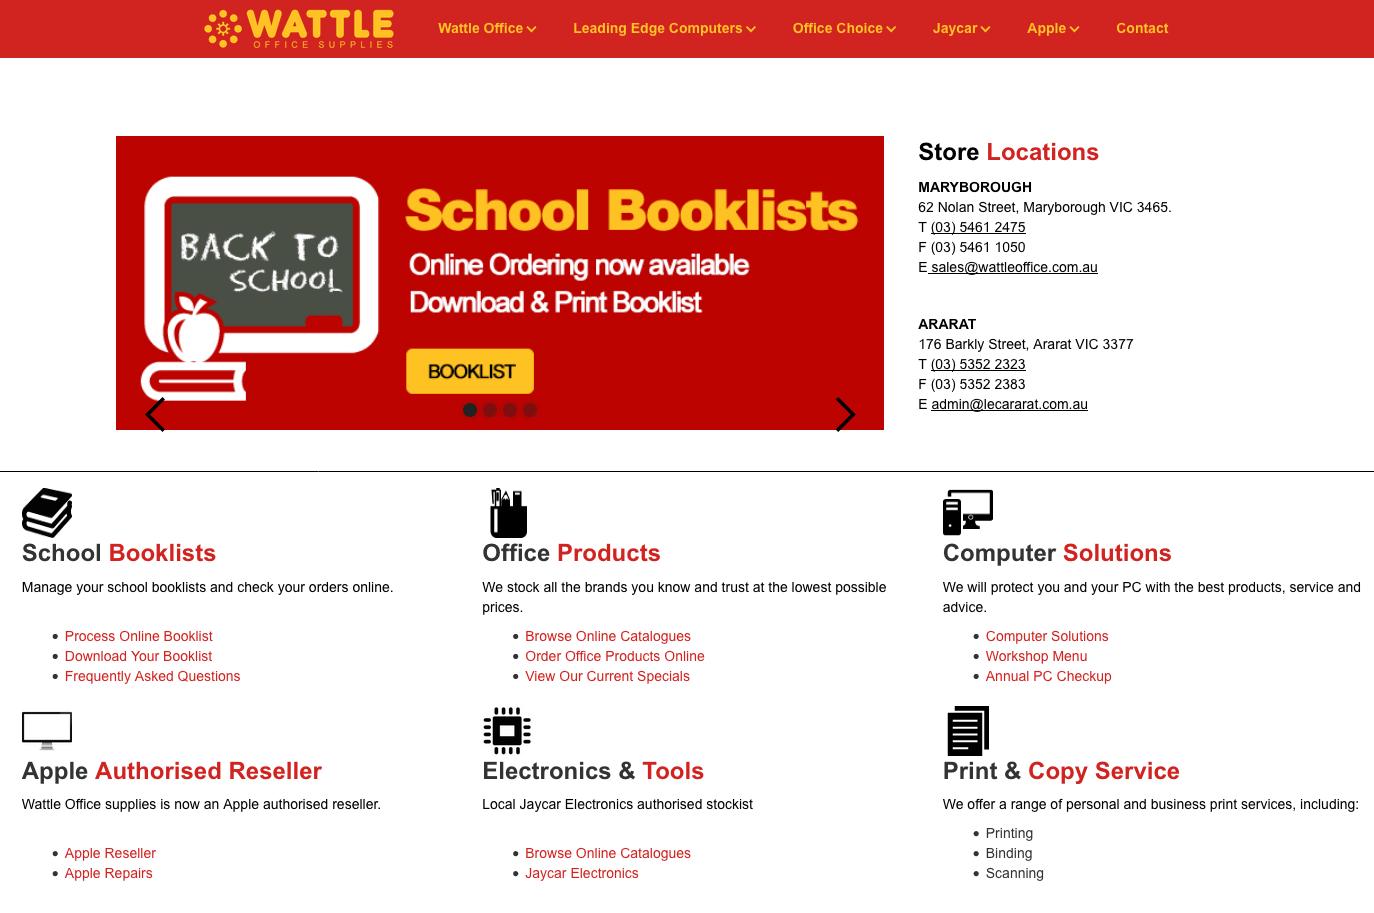 www.wattleoffice.com.au